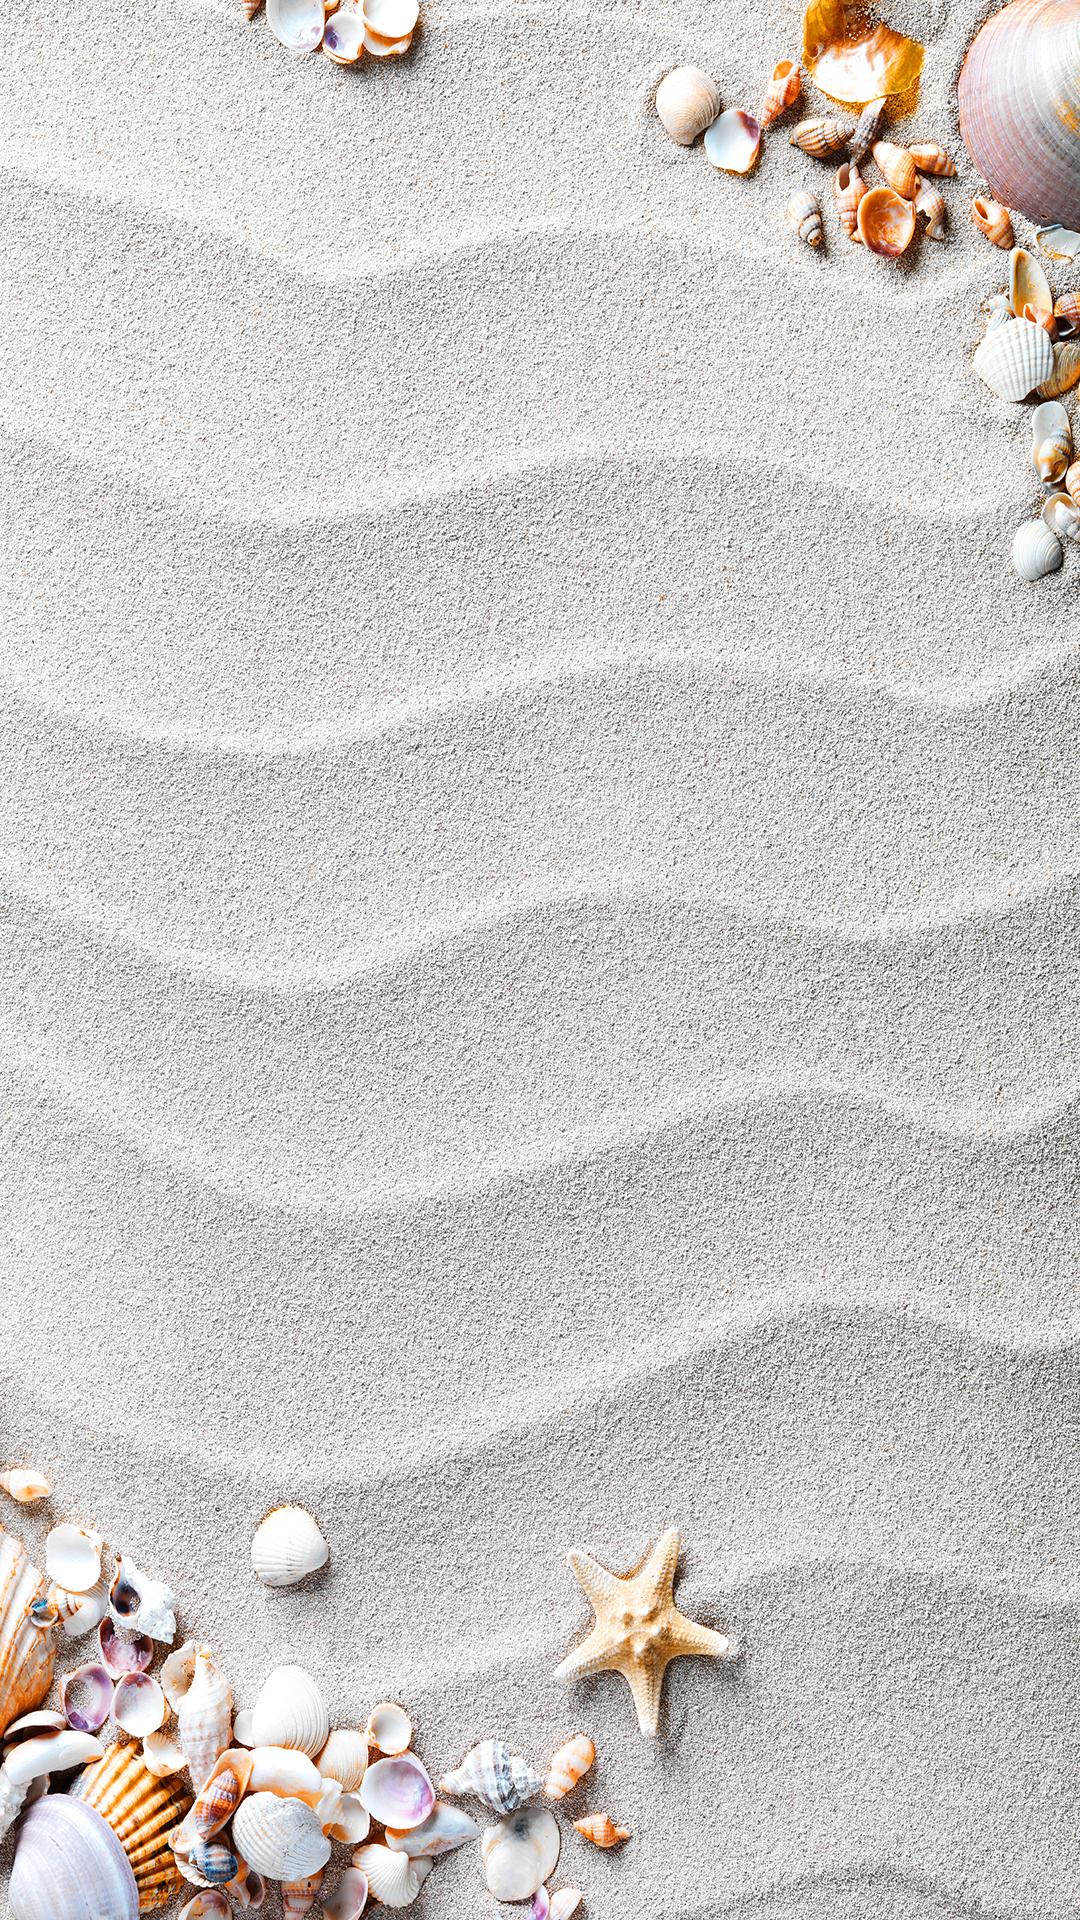 beach shells border h5 background material  beach  sand